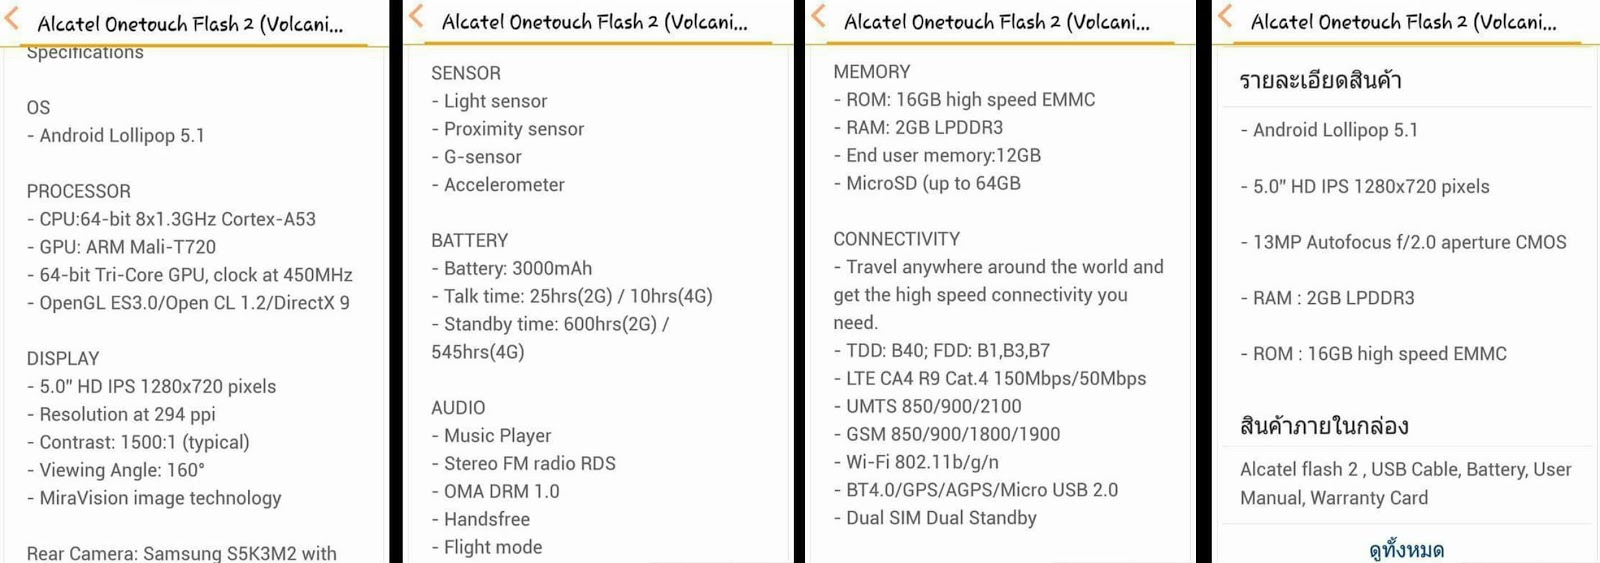 Leak Alert! Alcatel OneTouch Flash 2 leaks! Specs Price